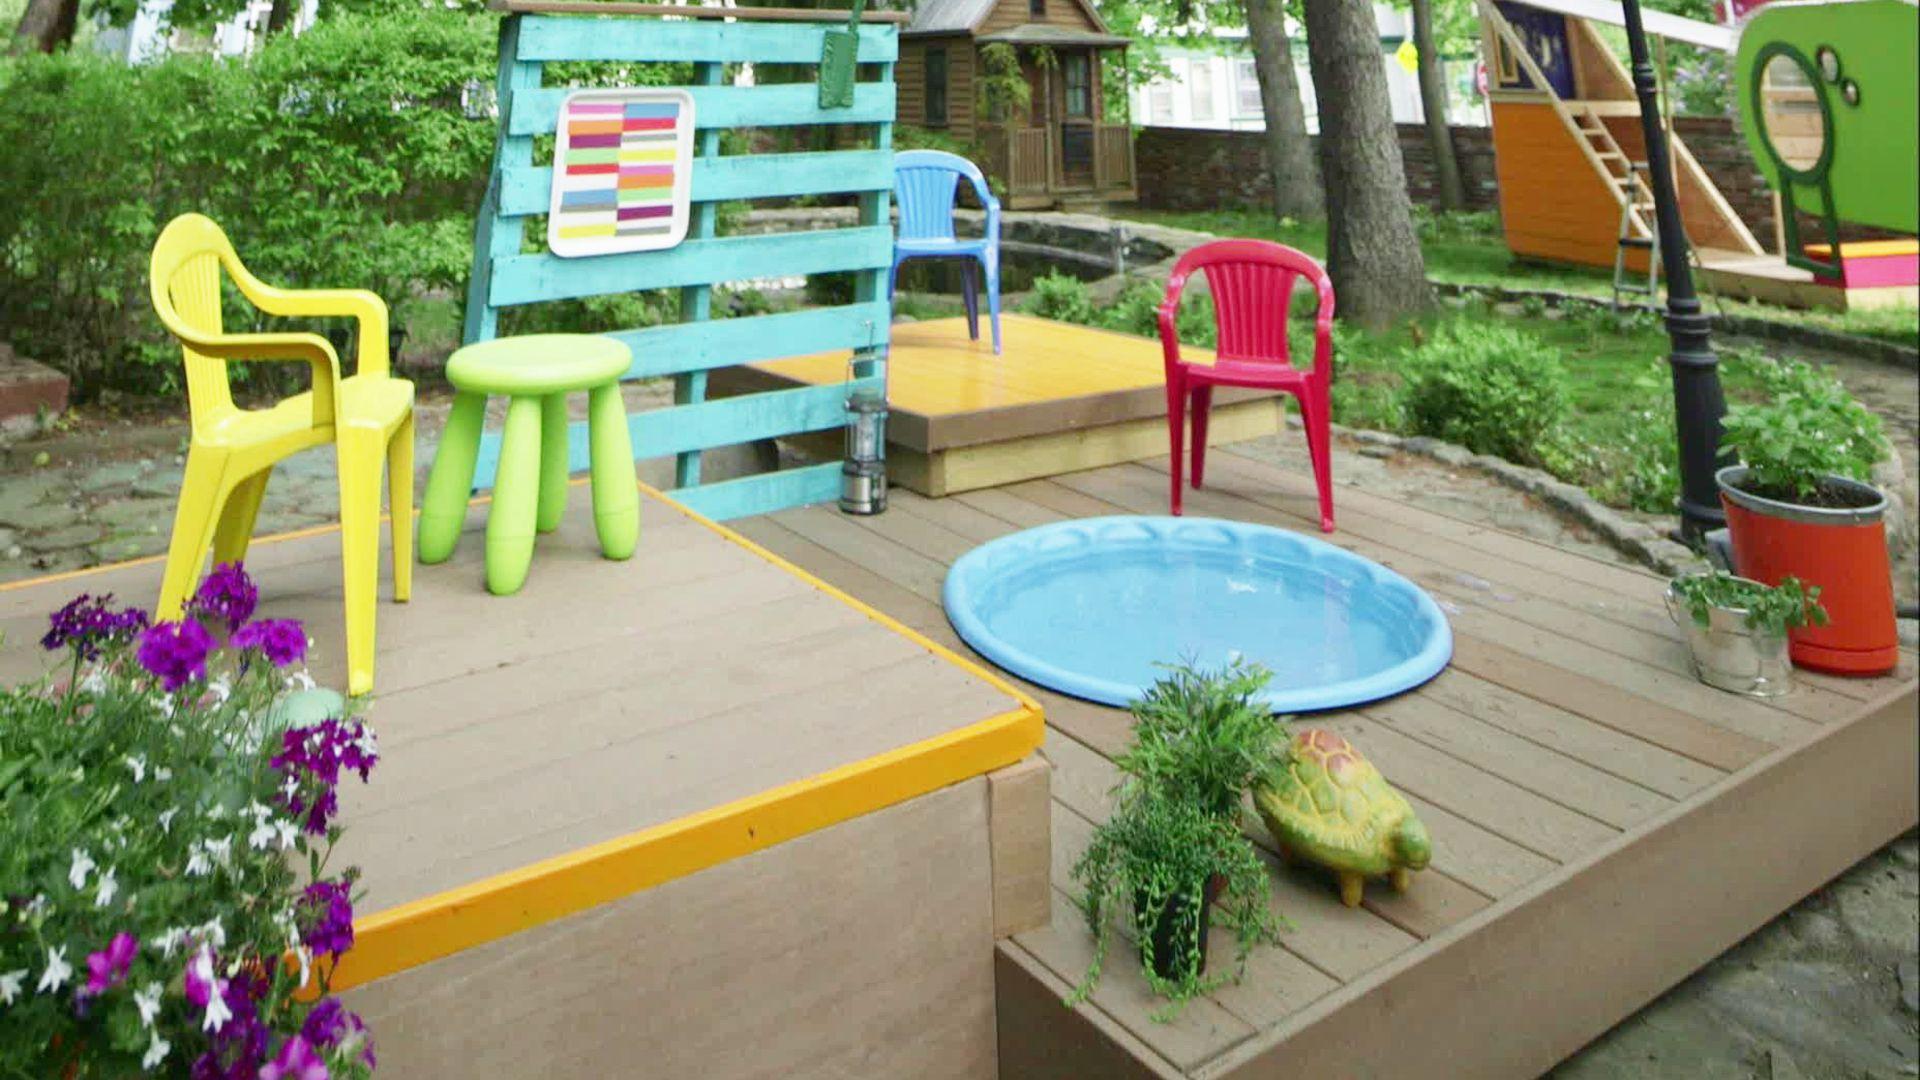 Build a deck around a small kiddie pool. Backyard play